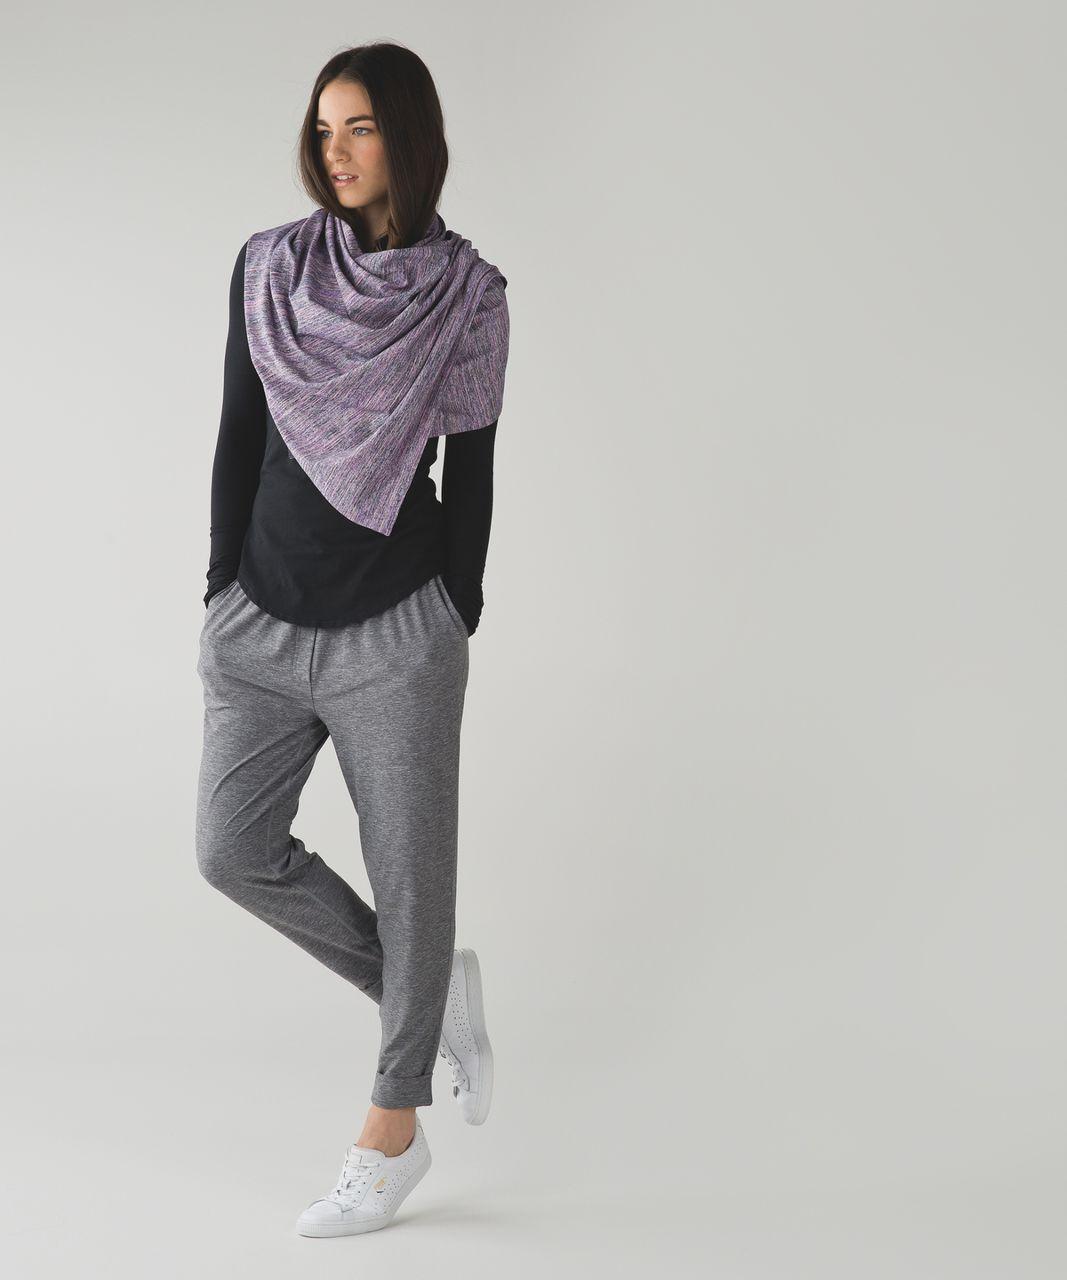 Lululemon Vinyasa Scarf *Rulu - Space Dye Camo Tender Violet Black Grape